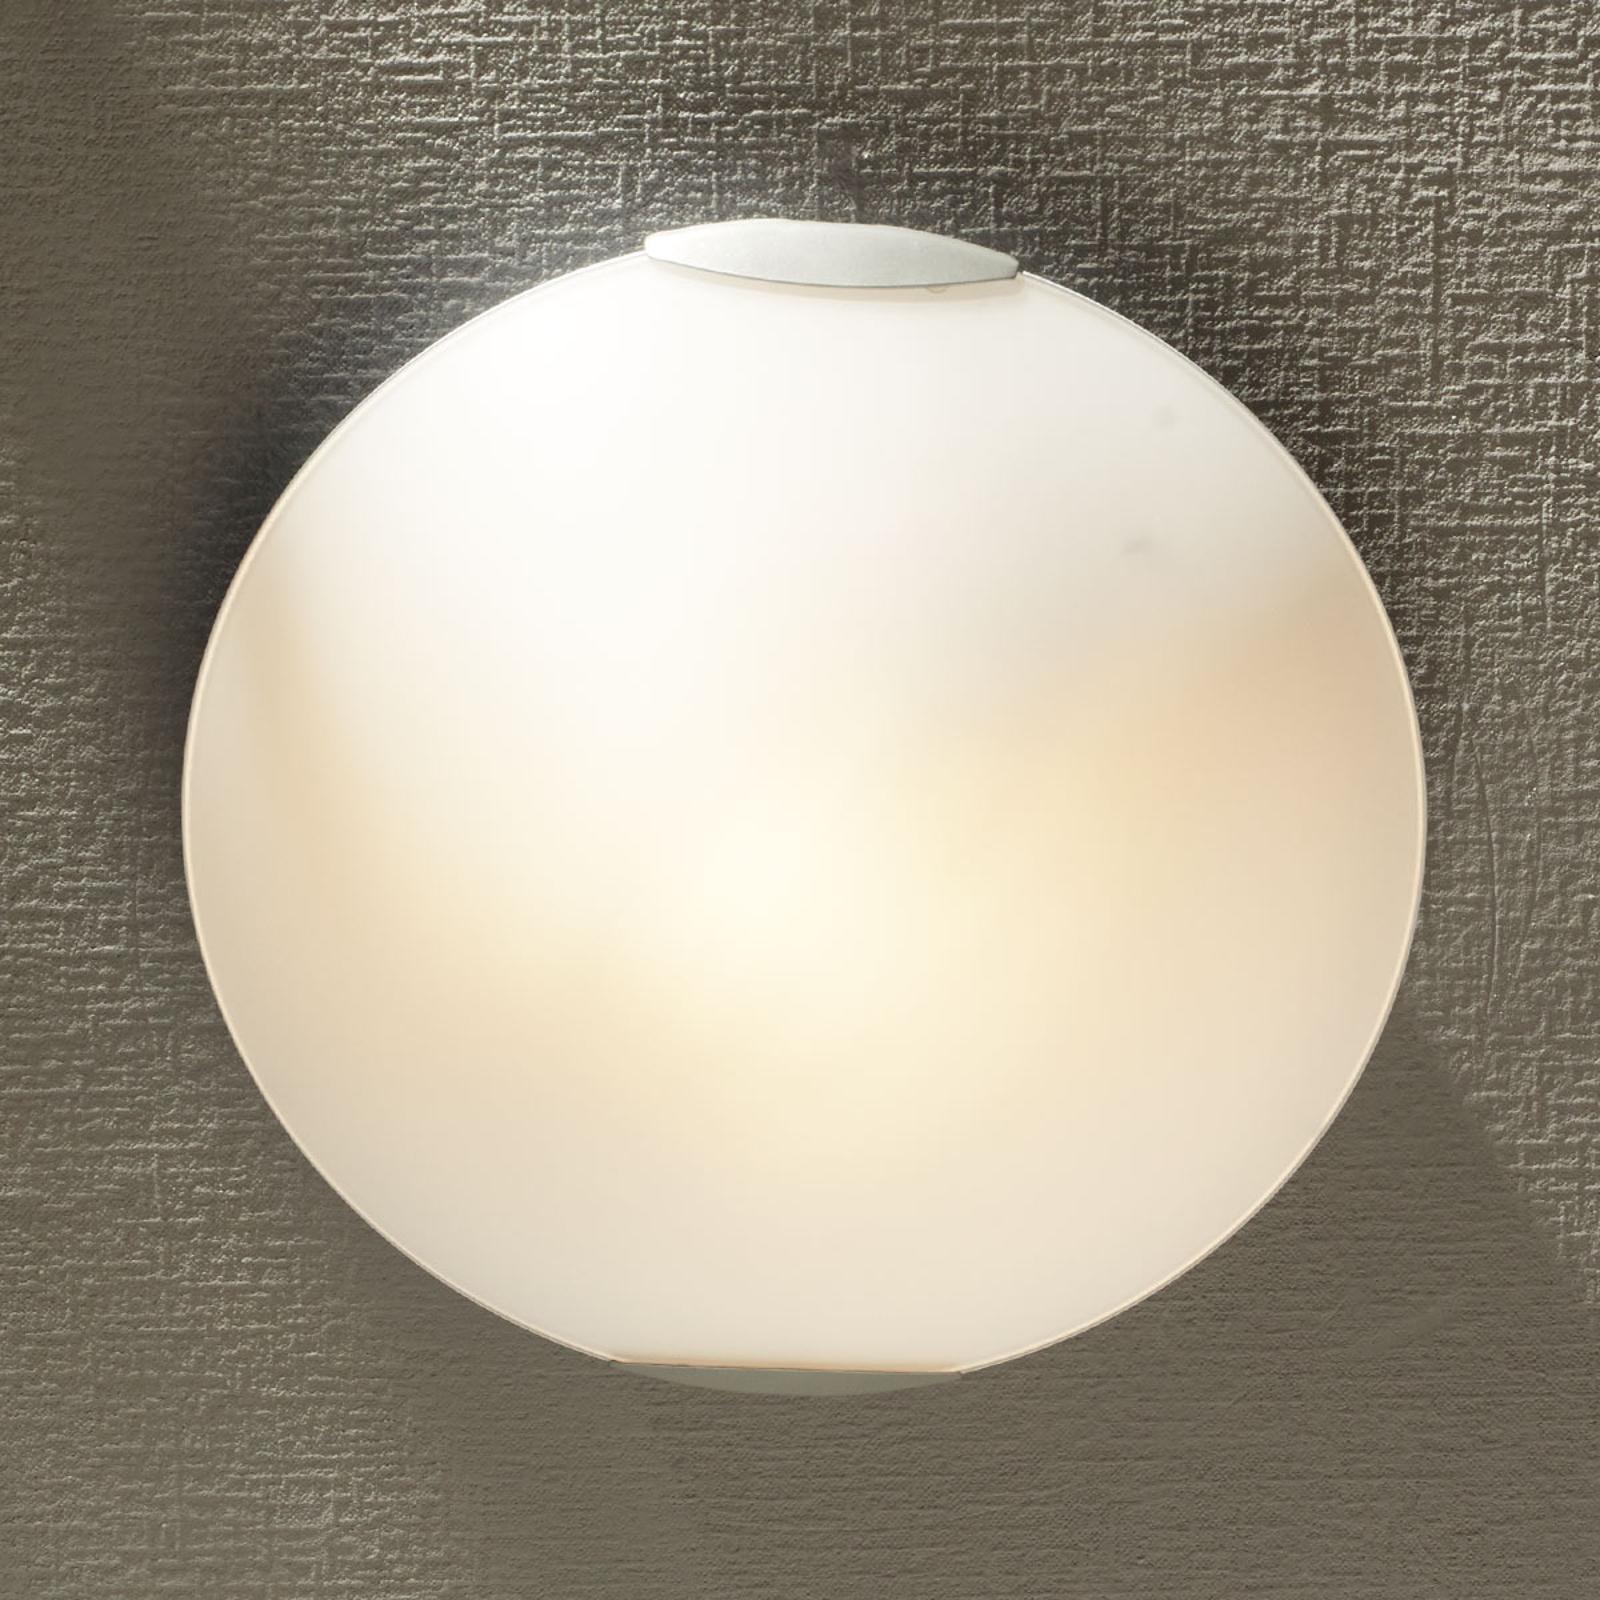 Lampa sufitowa FOX, 30 cm